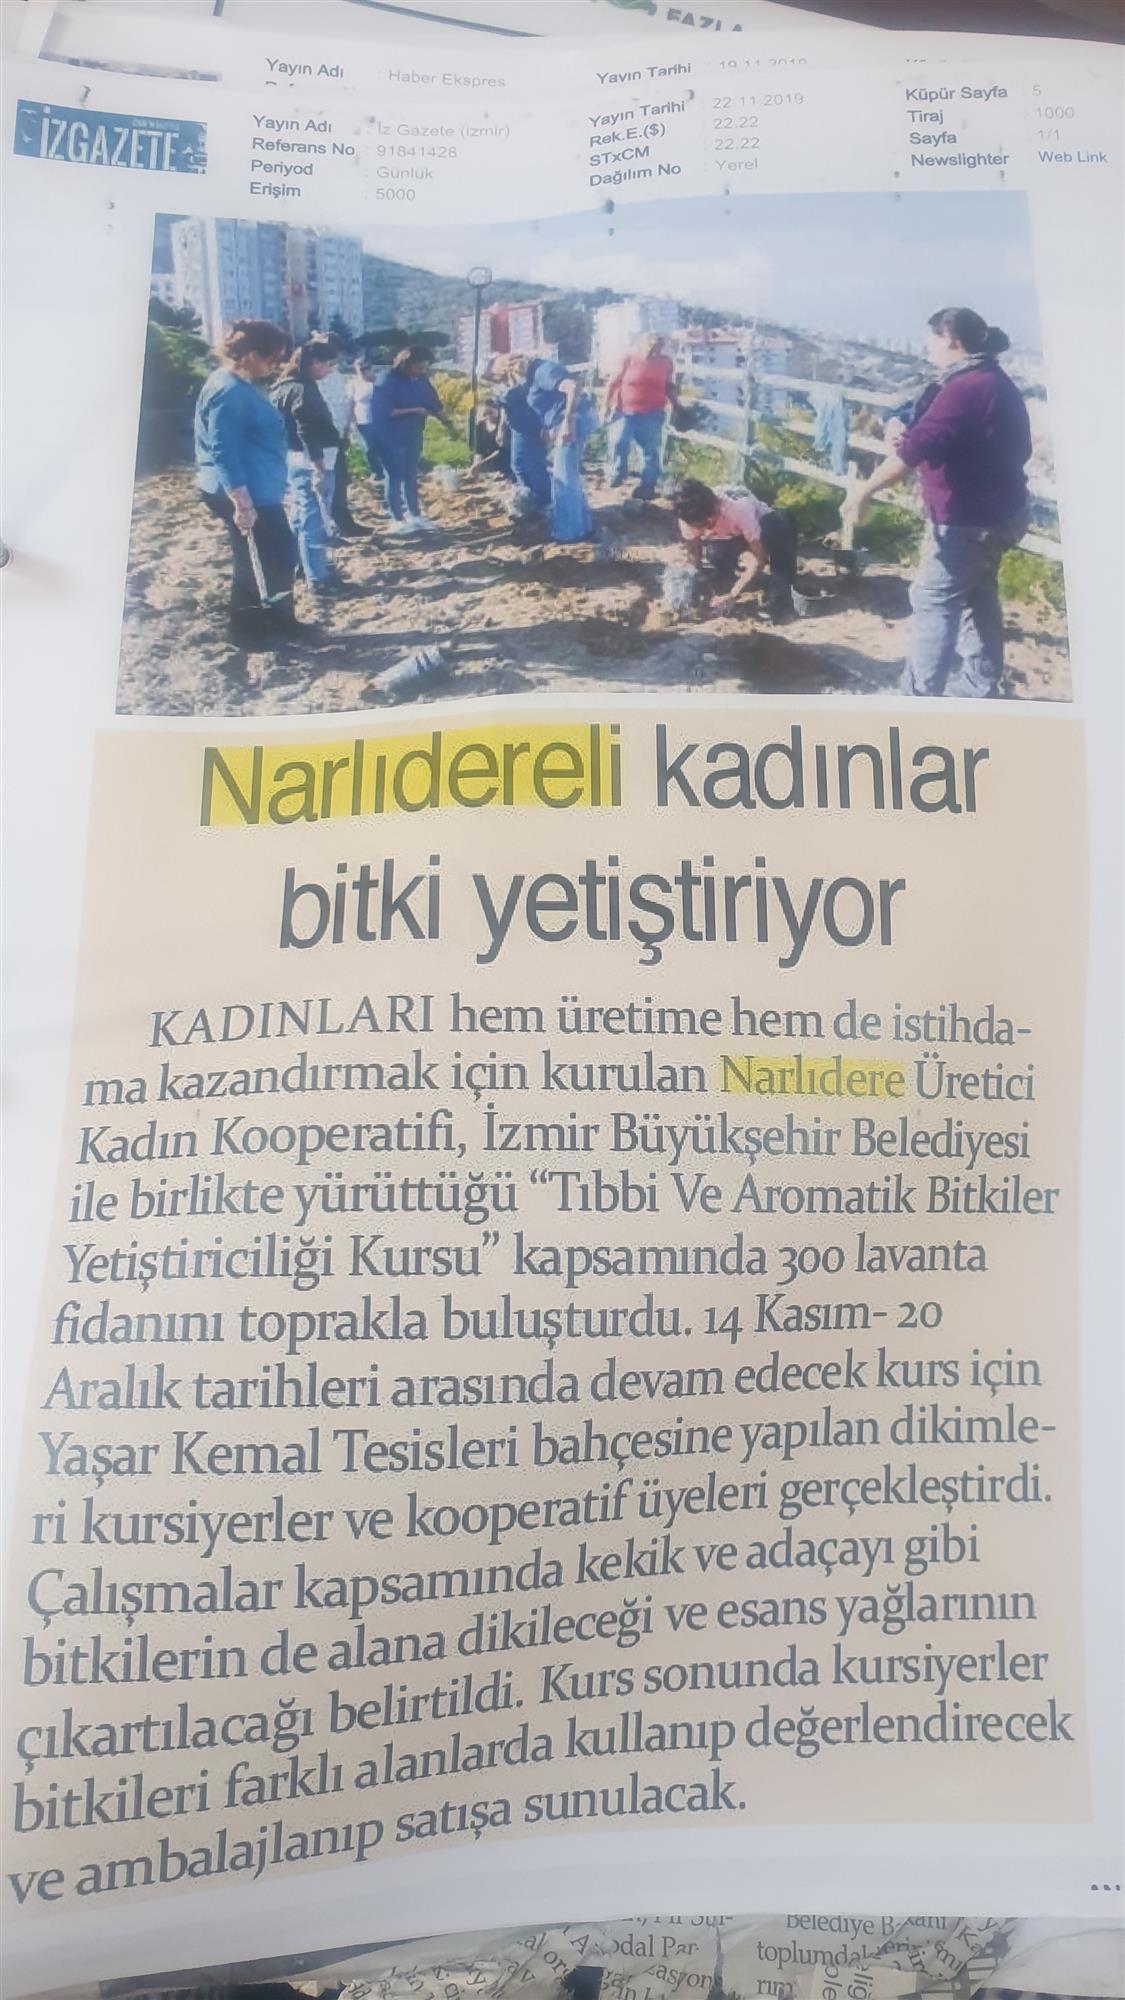 gazete-haberleri202012816716632